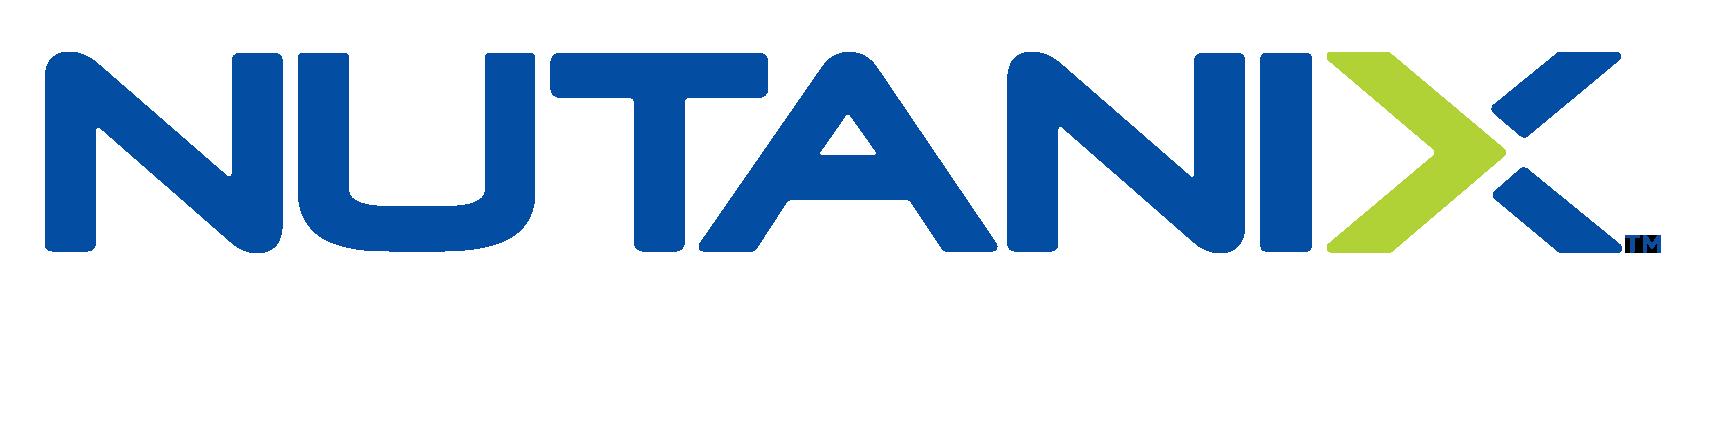 nutanix-logo-HI-REZ-full-color